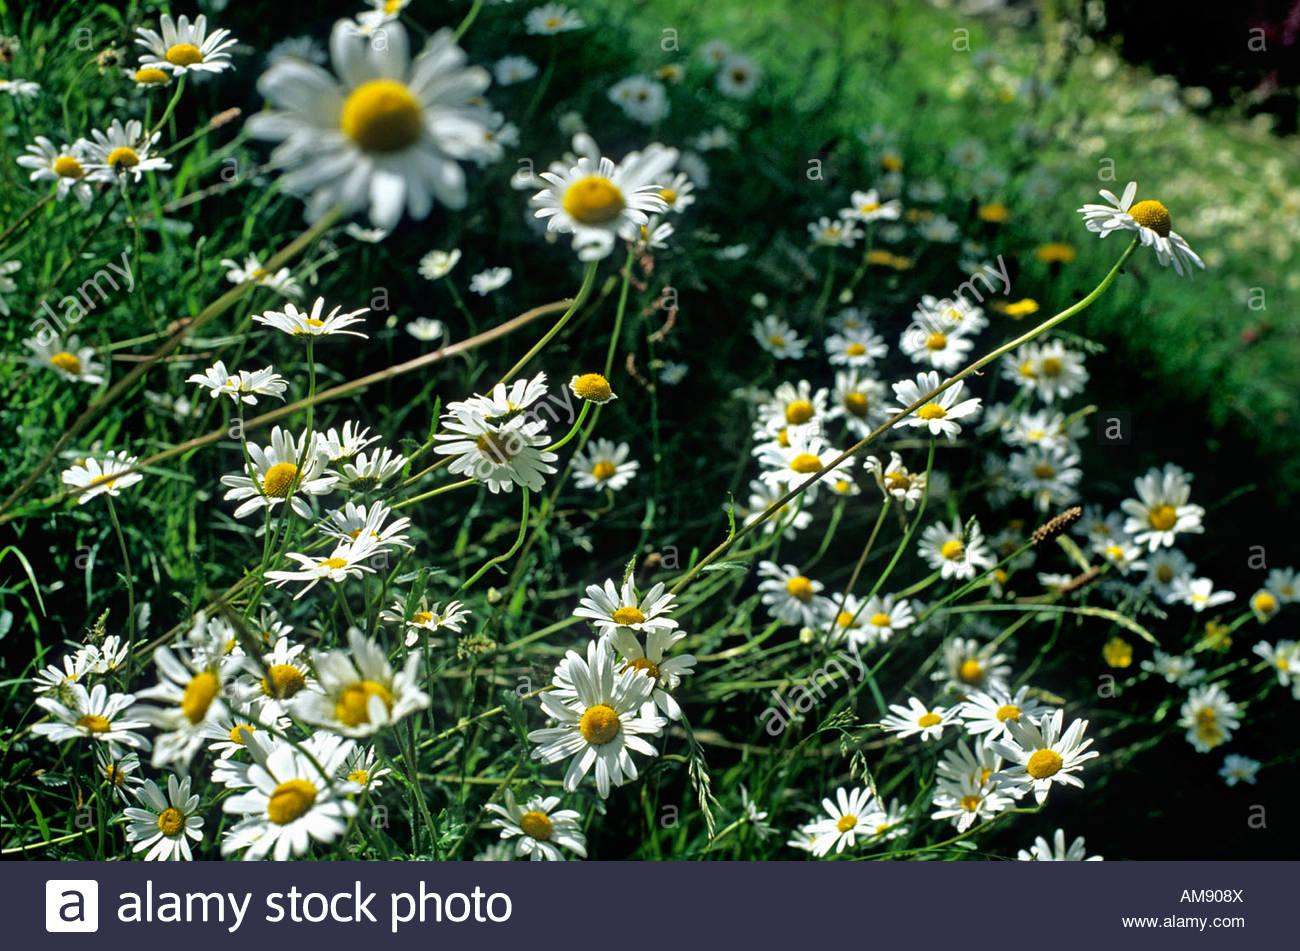 Daisy Like Flowers Stock Photos Daisy Like Flowers Stock Images